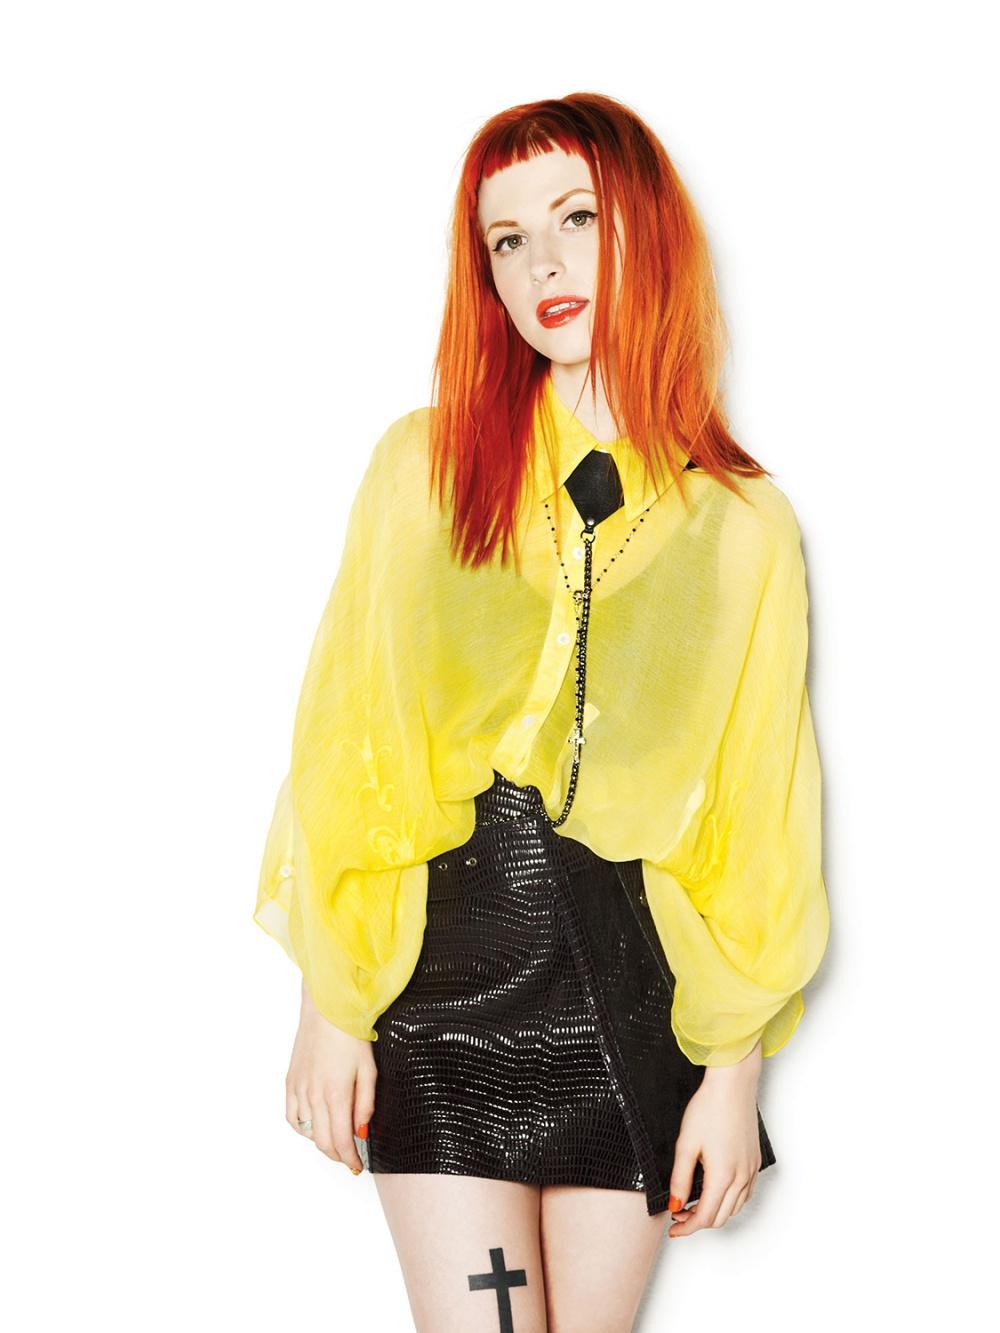 Hayley williams fashion site 85